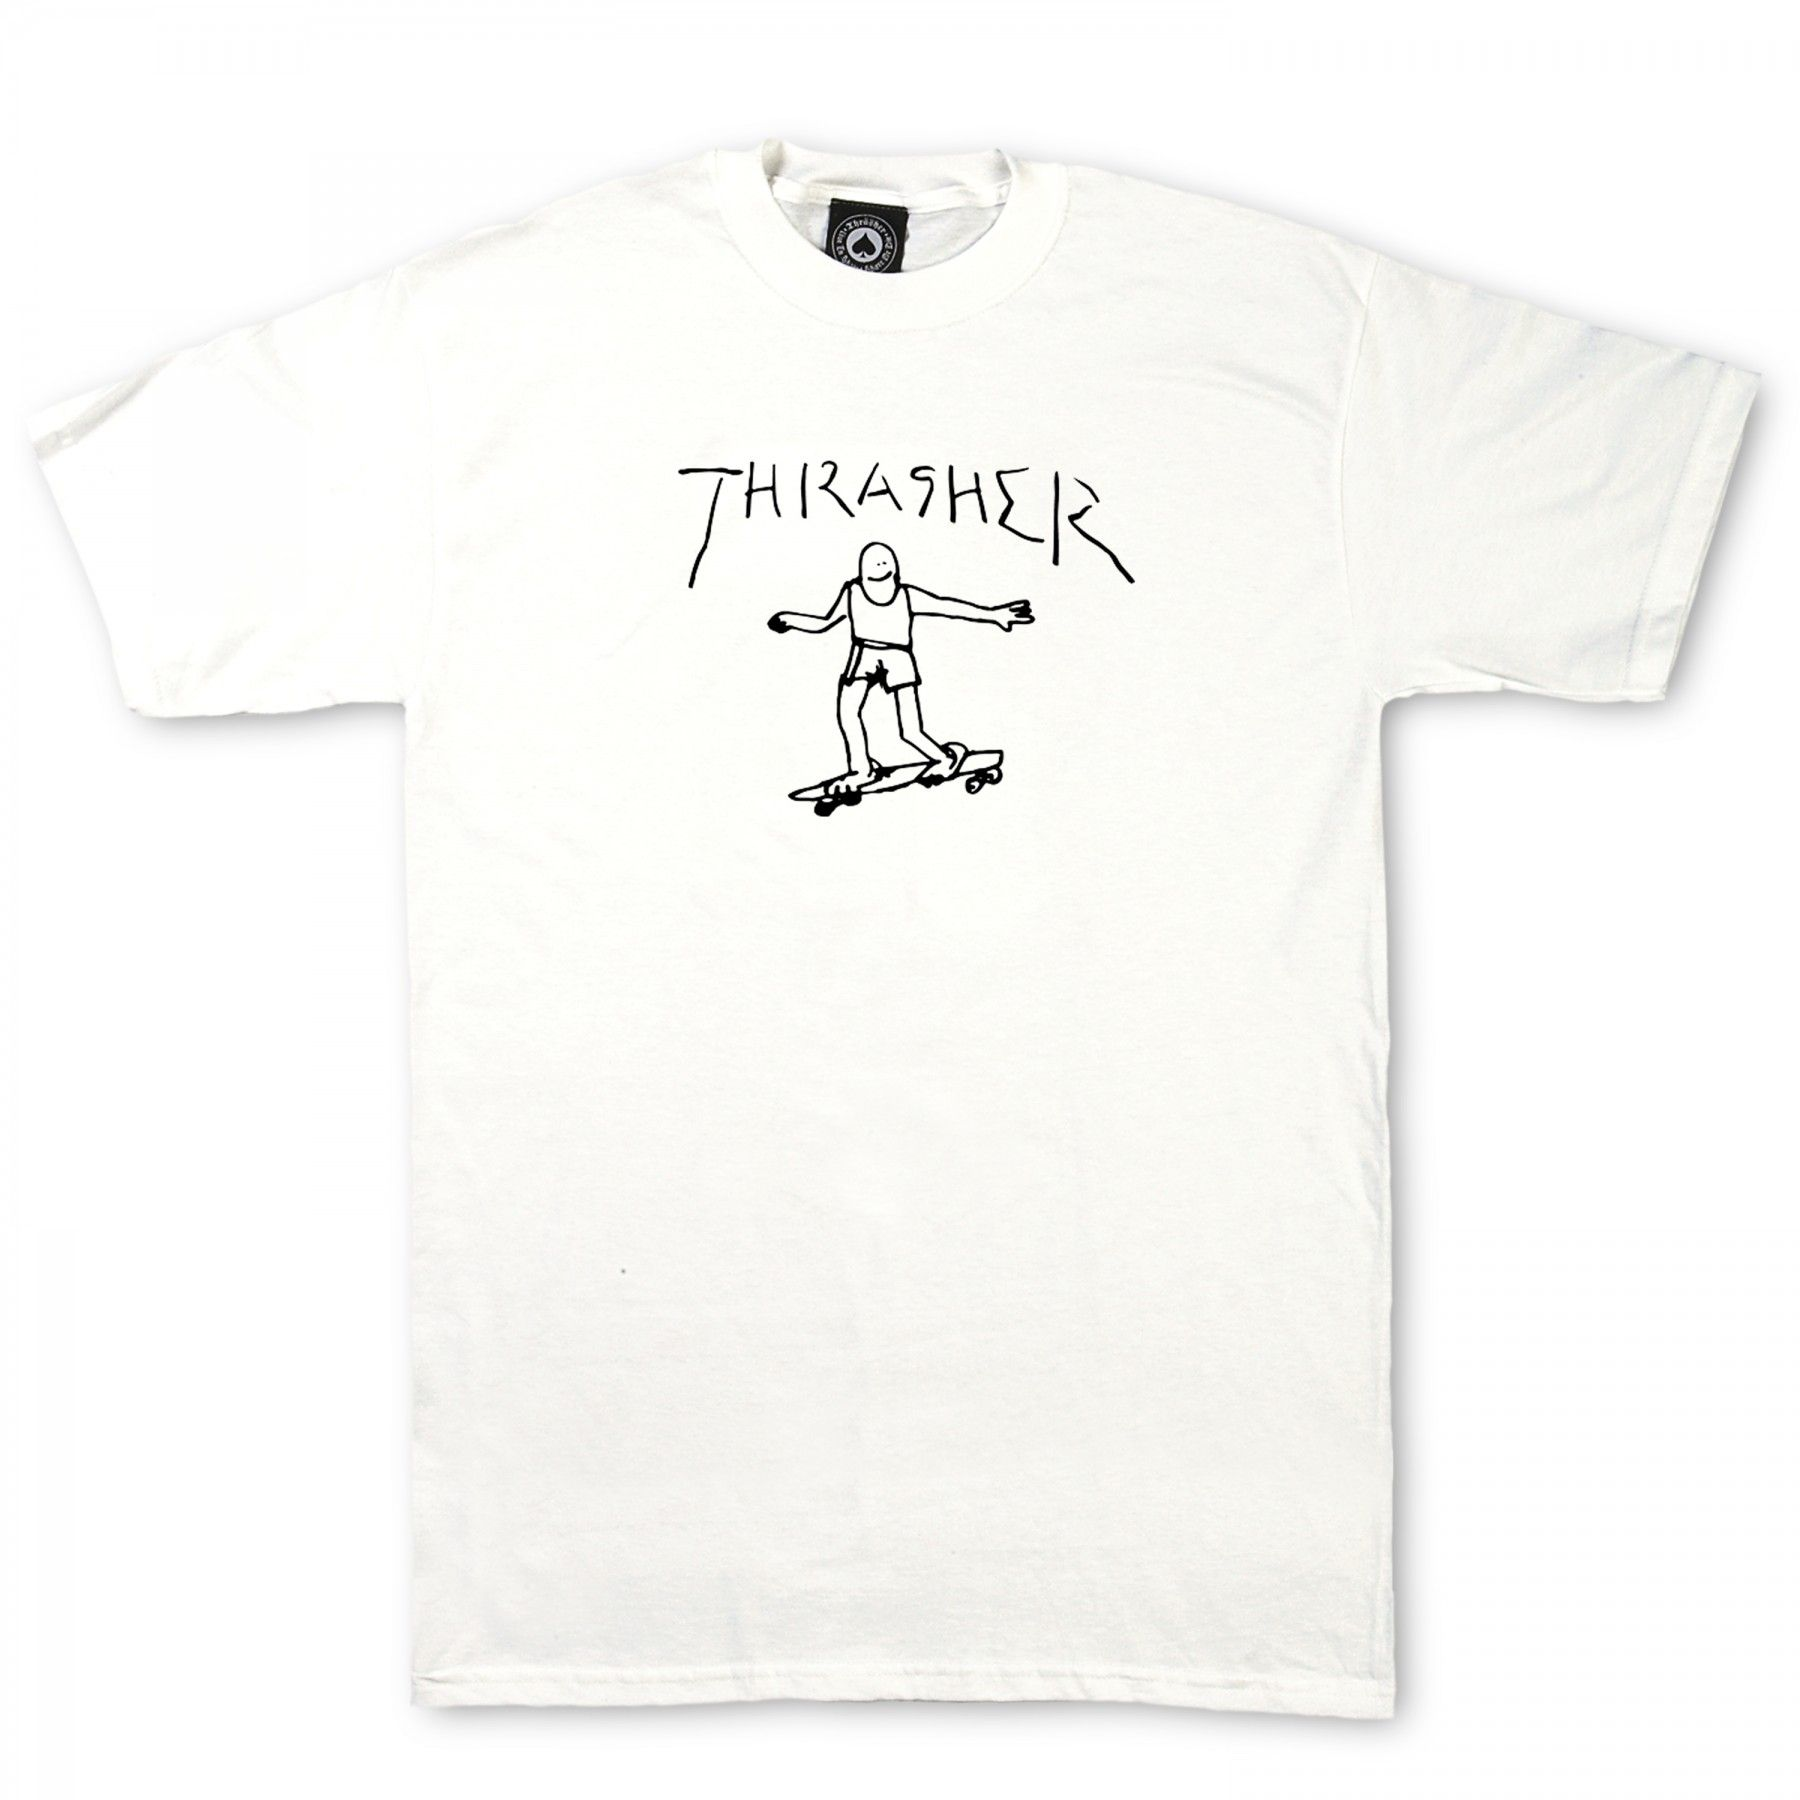 7cebe11d657e Thrasher Gonz Shirt Sleeved Tee (White) | Shirts